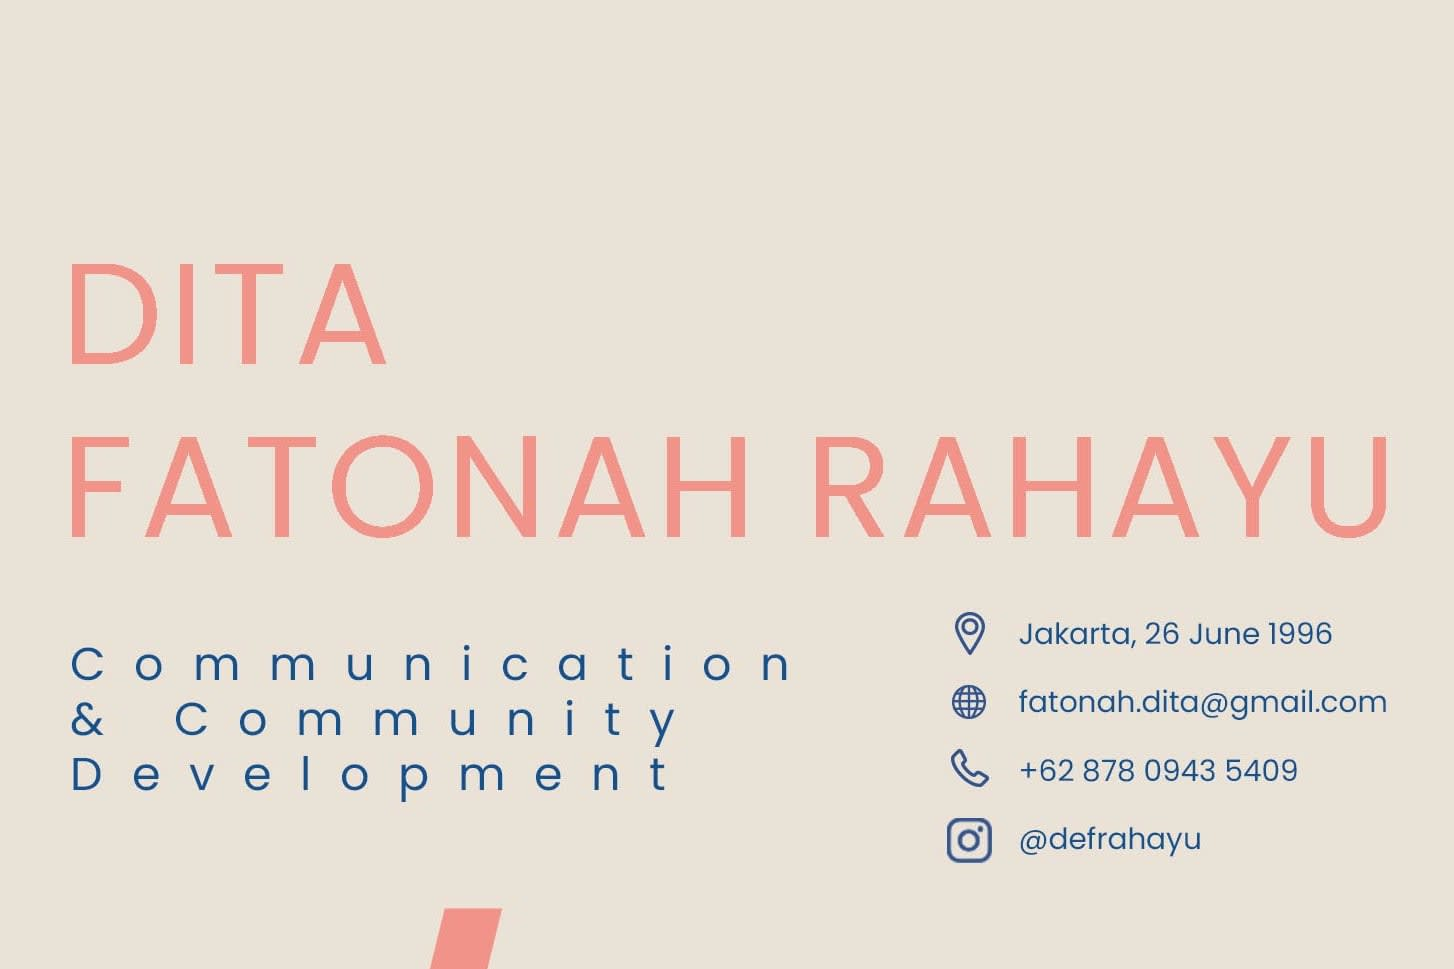 Portfolio for Communication and Community Development